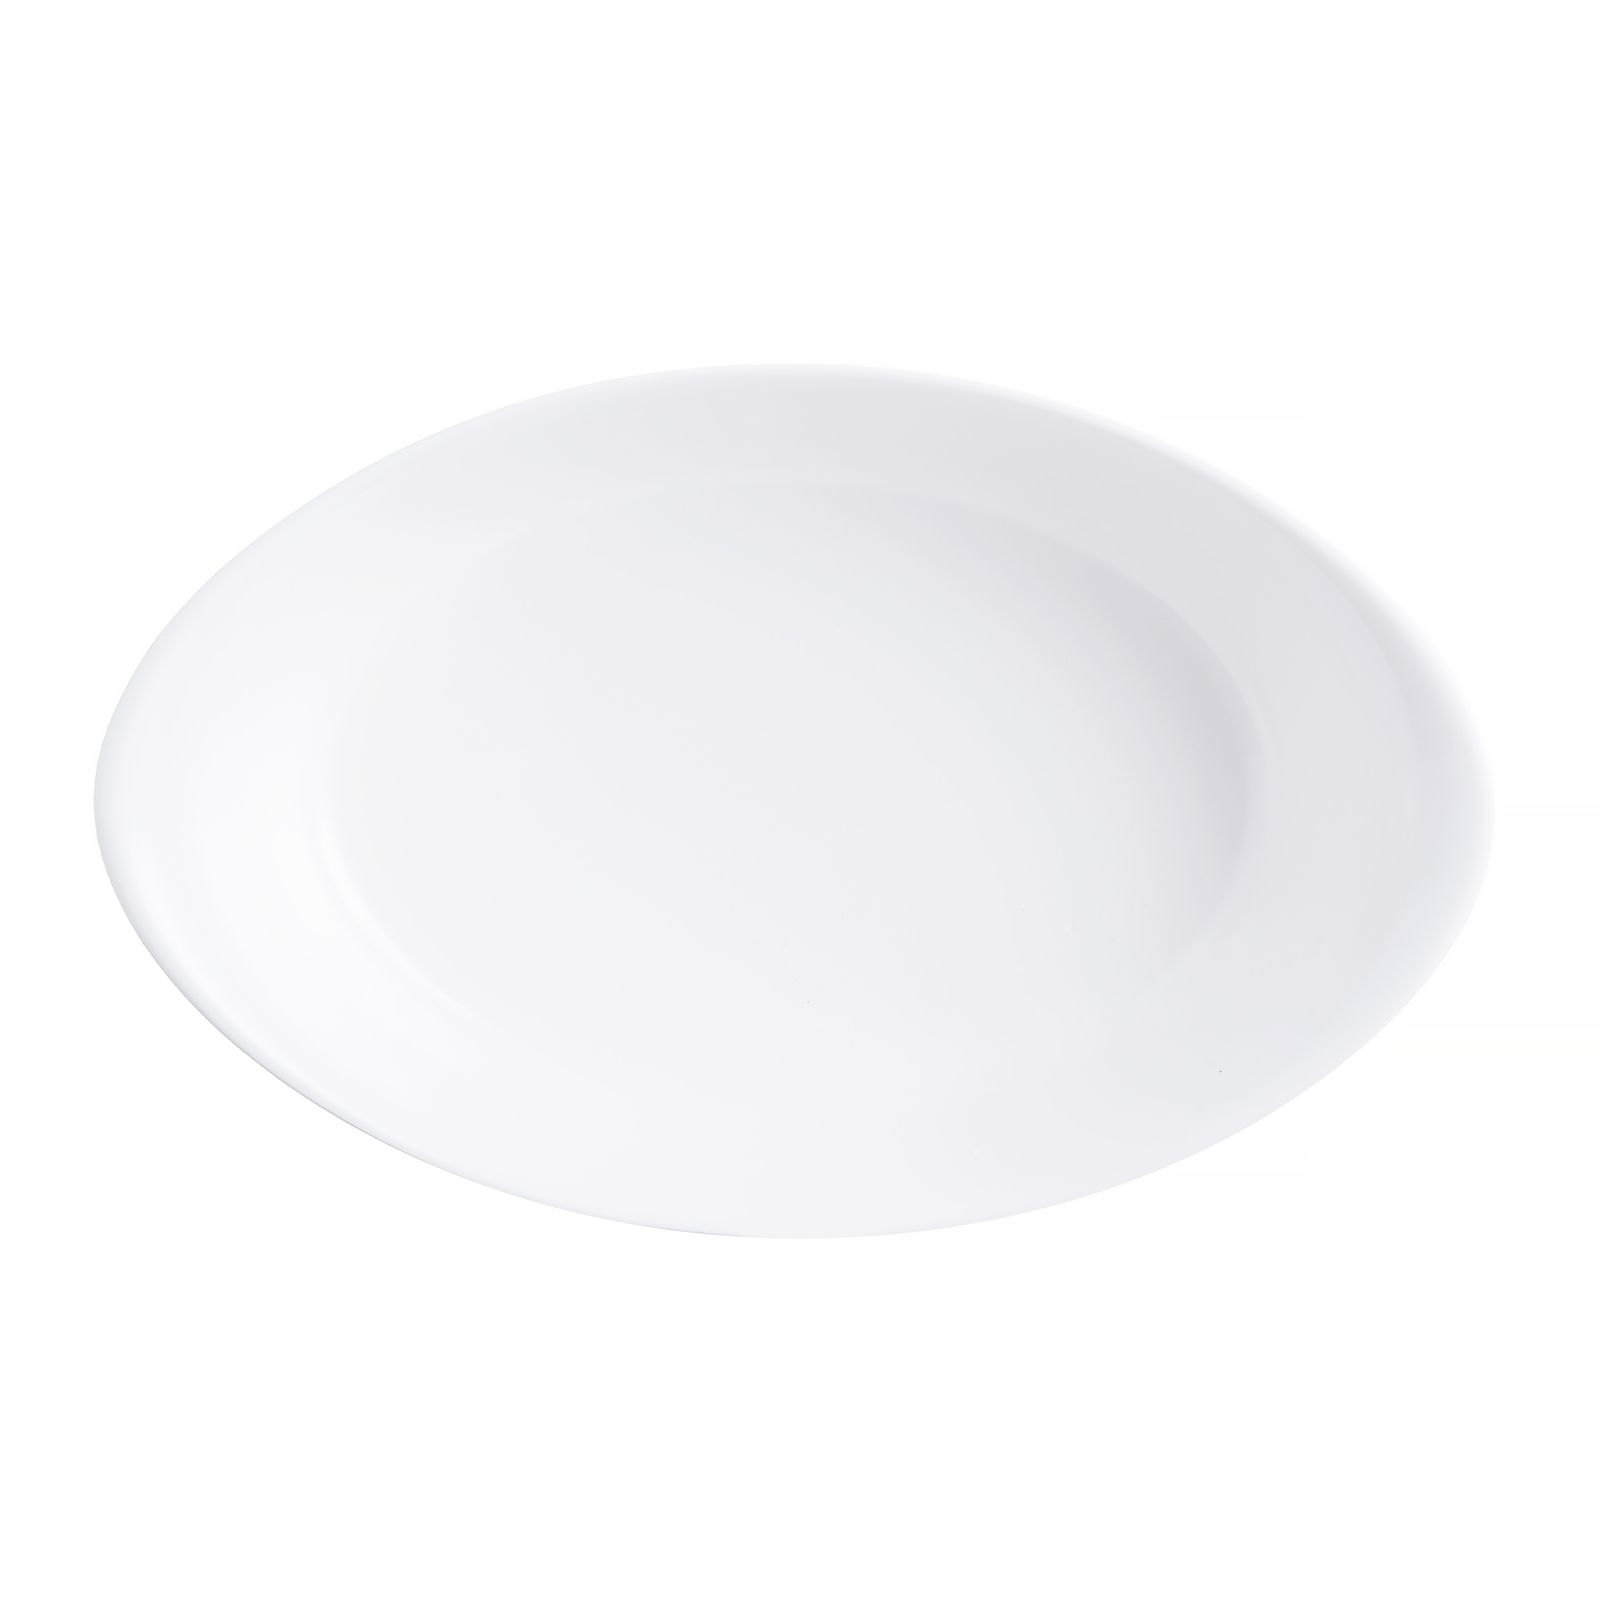 Ugnsform oval Smart Cuisine 28 x 17 cm LUMINARC